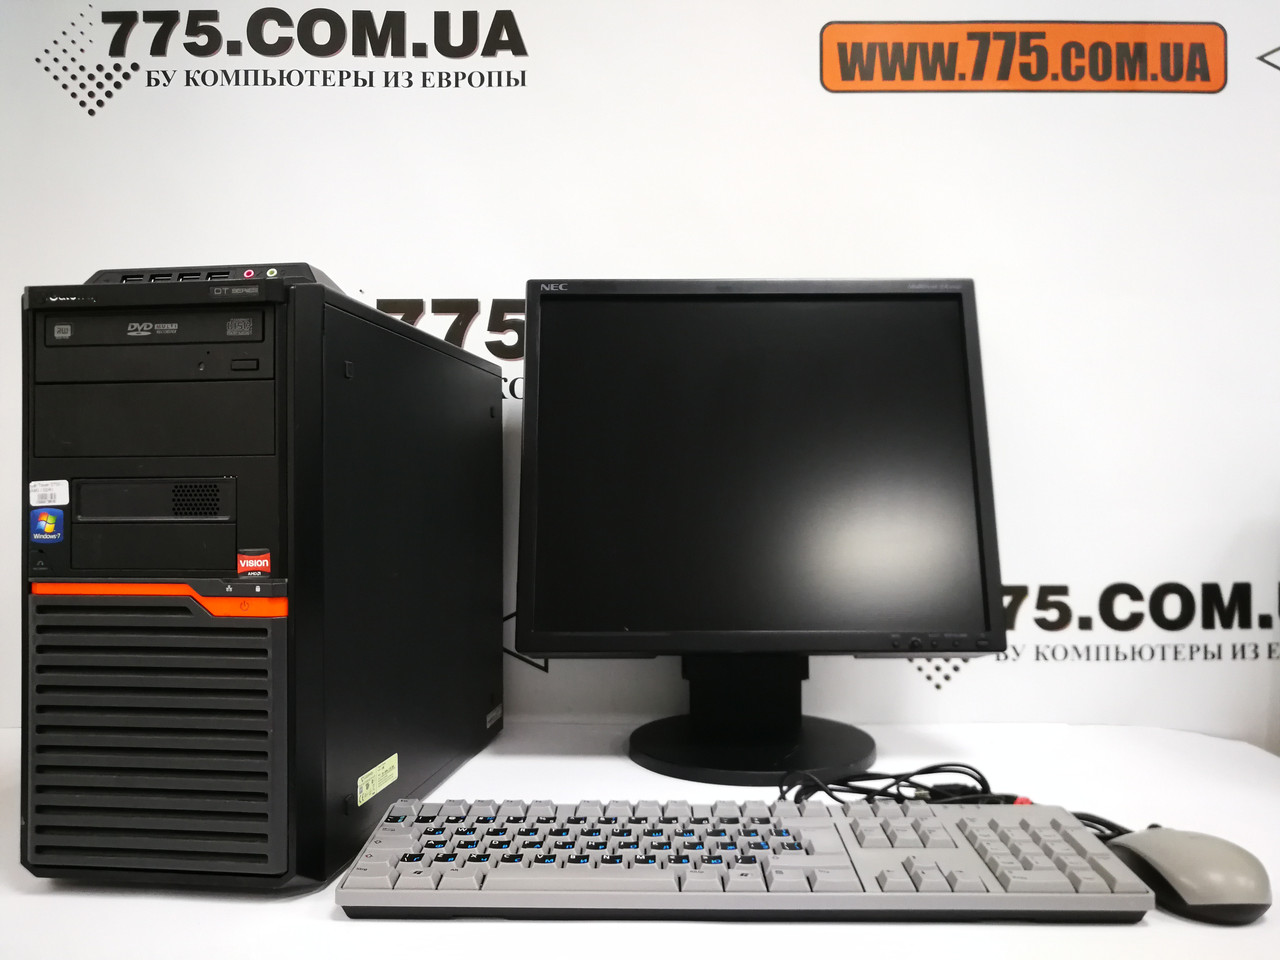 "Комплект: компьютер Athlon 3.1ГГц, Монитор 19"" (1280х1024, звук), клавиатура, мышь"